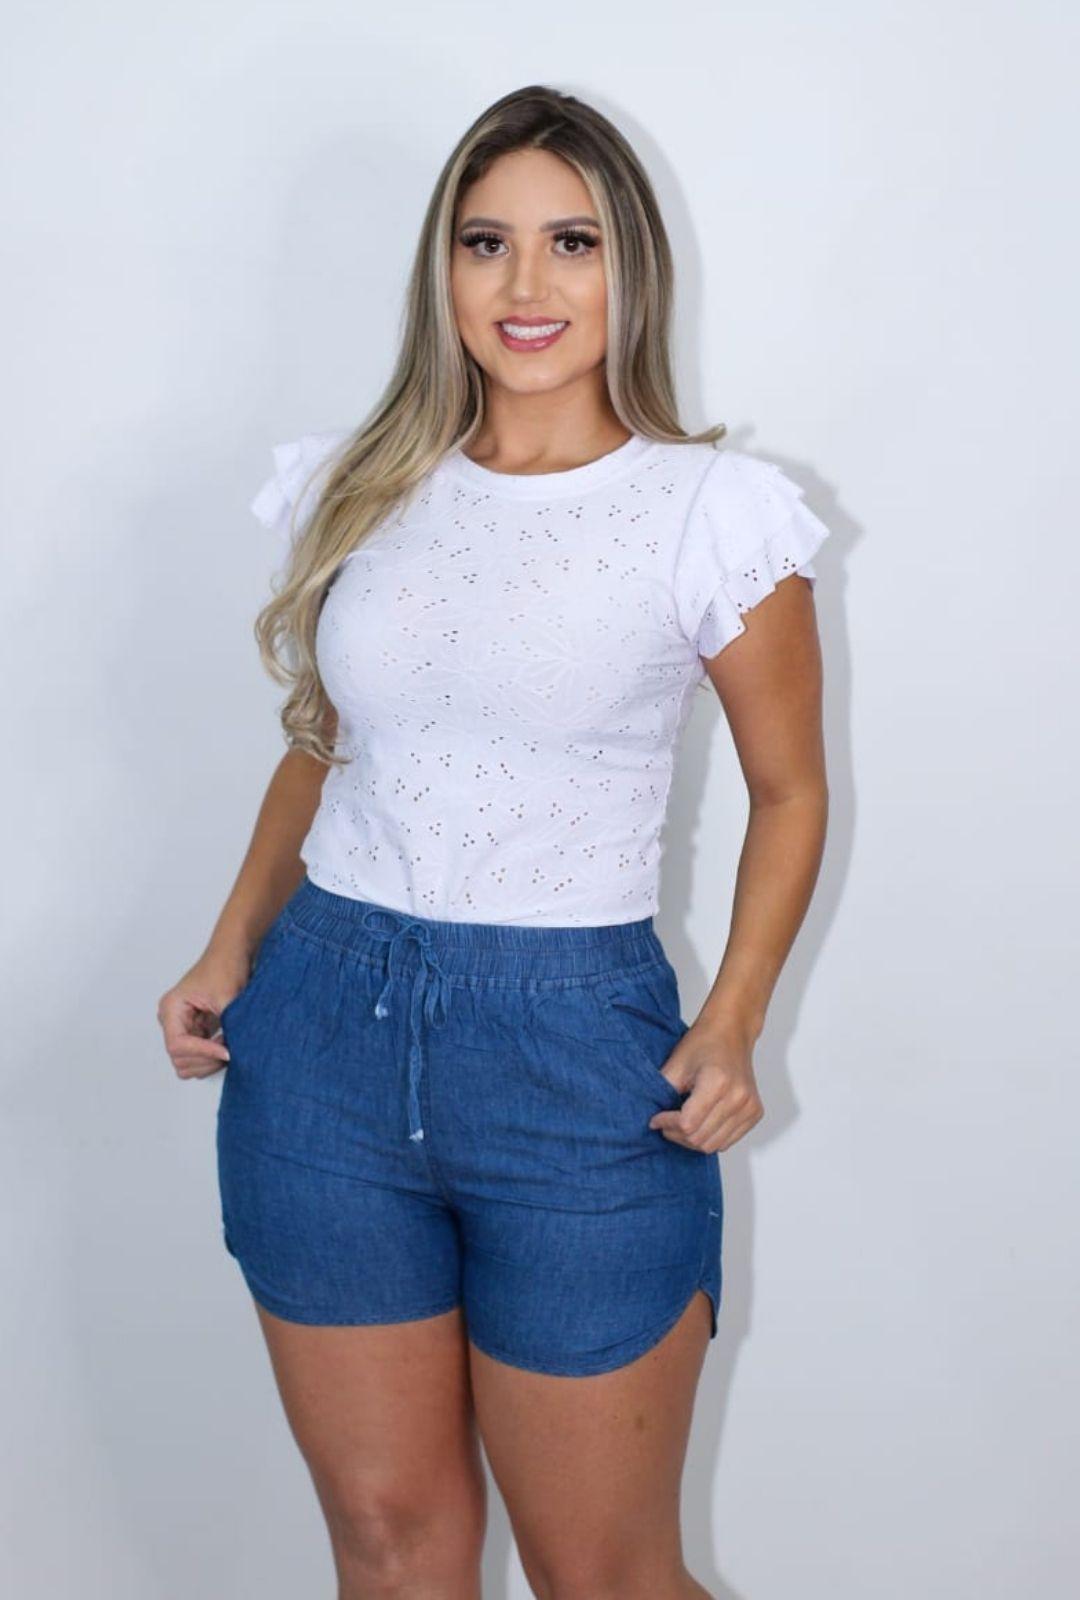 Shorts Feminino Estilo Jeans.  - ModaStore